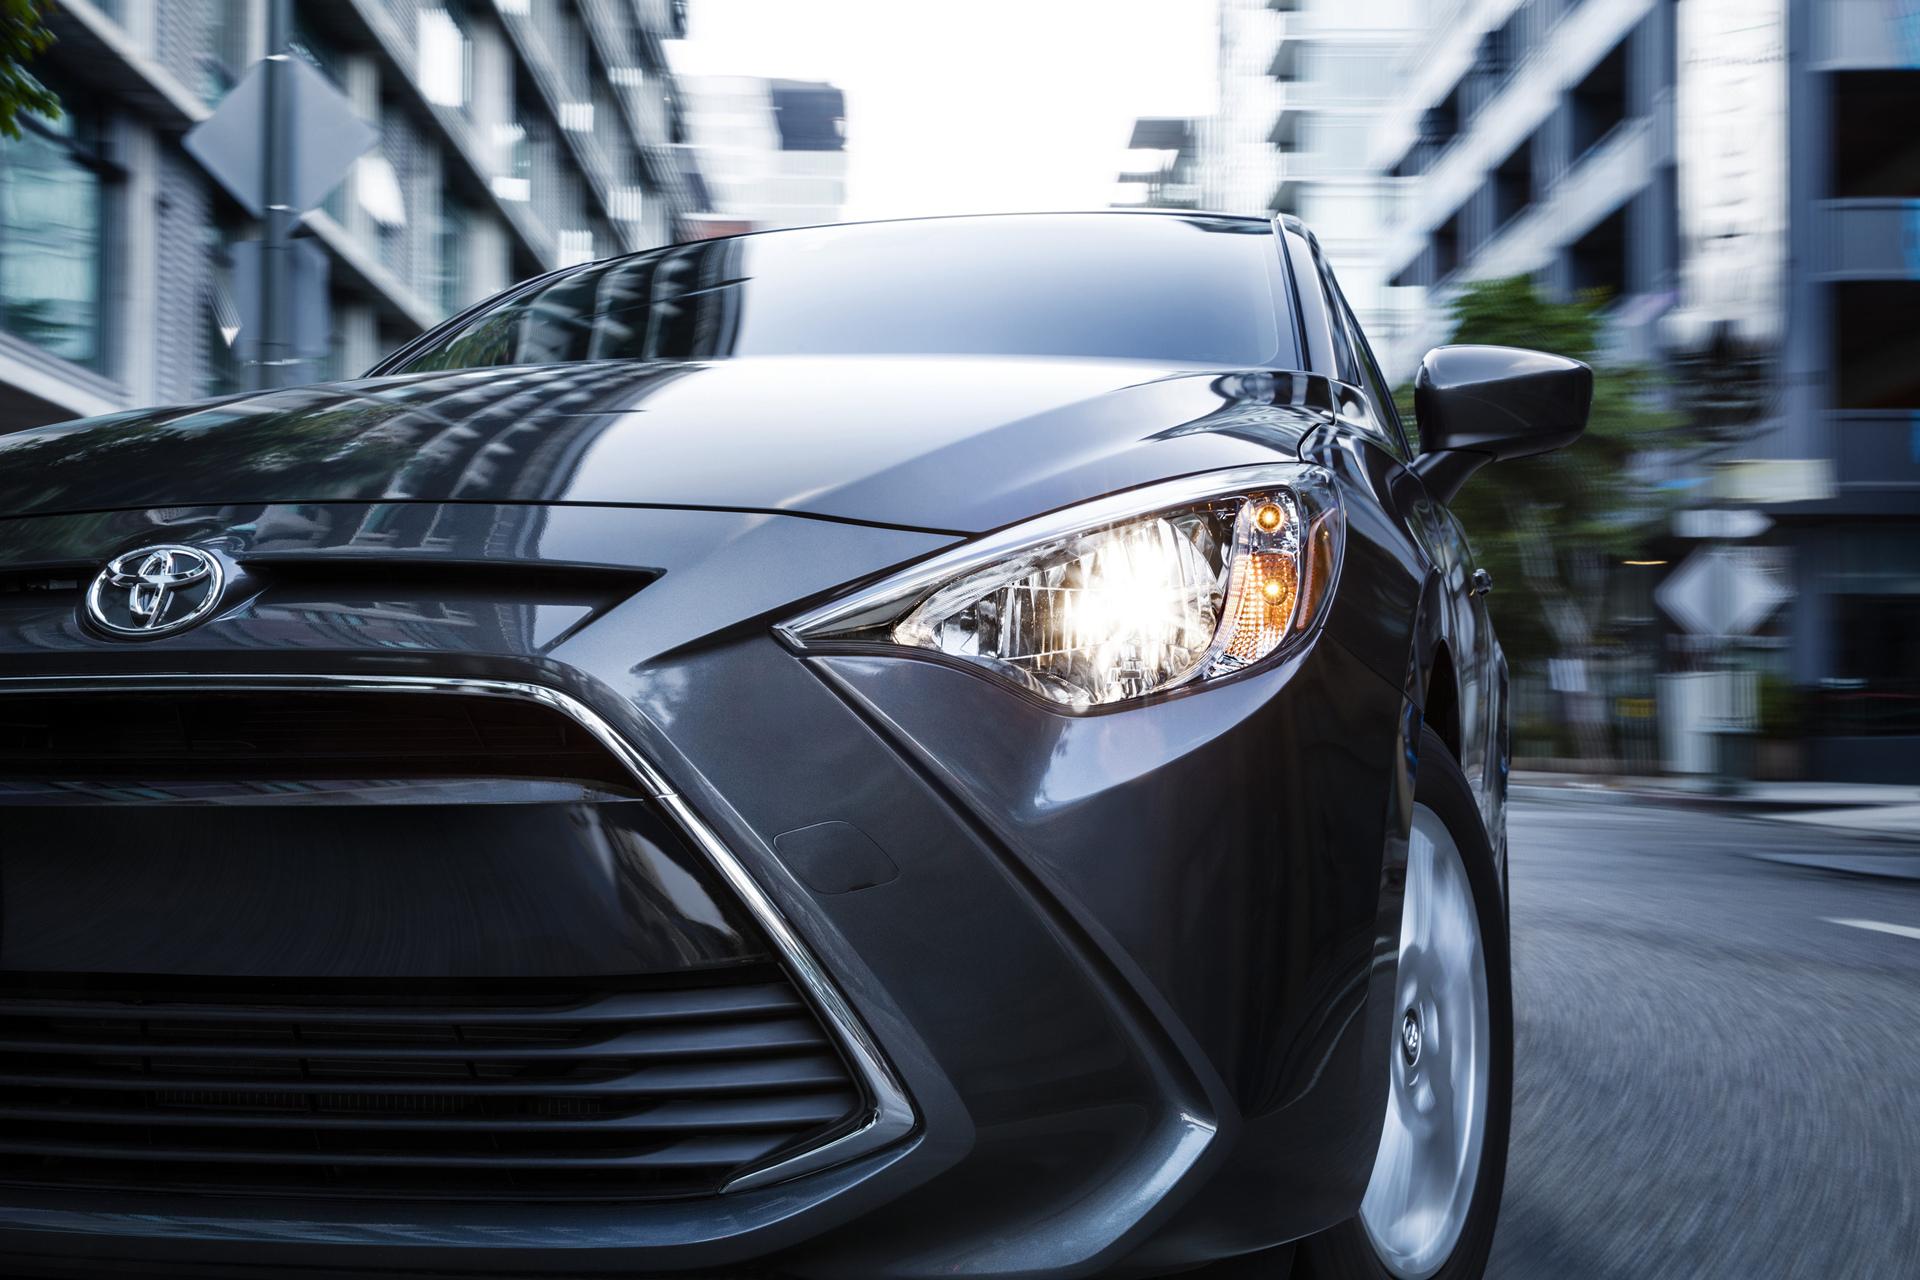 2017 Toyota Yaris iA © Toyota Motor Corporation